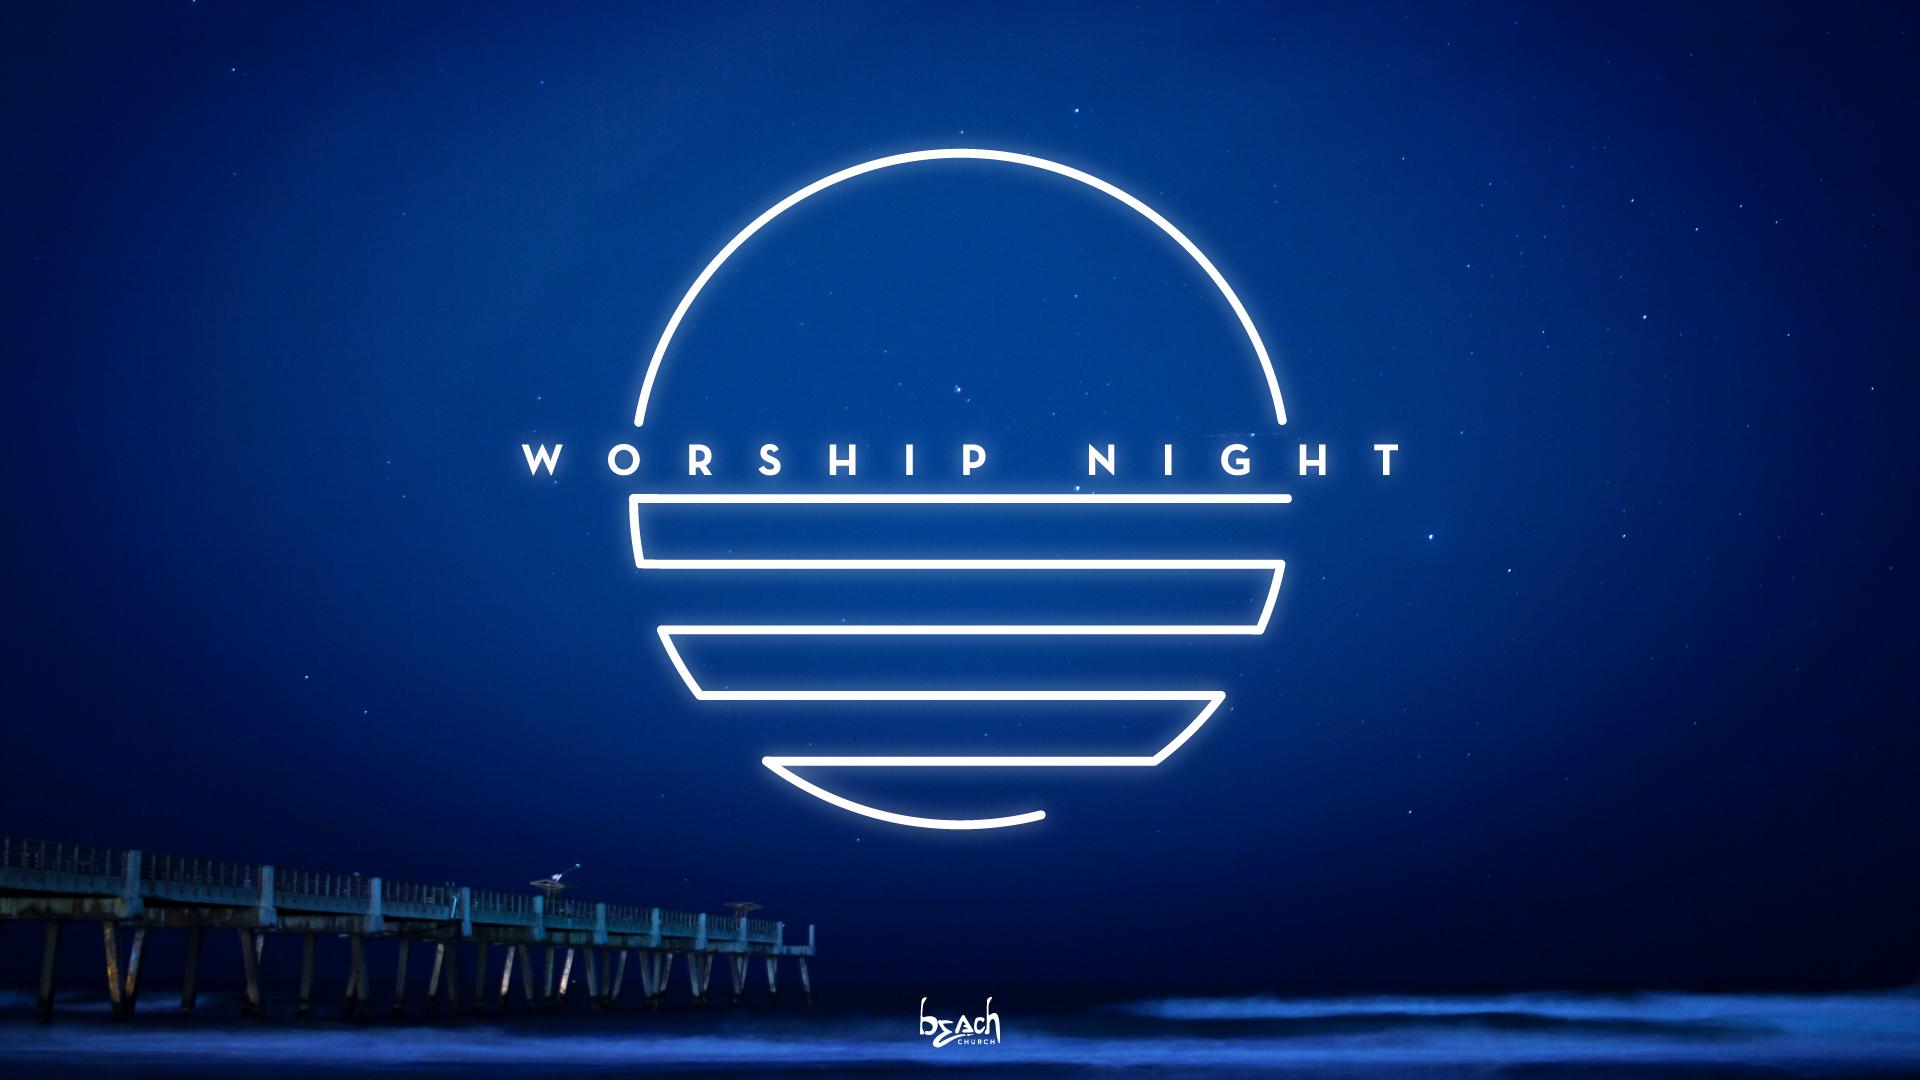 worshipnight_may18_1920x1080NoDate.jpg